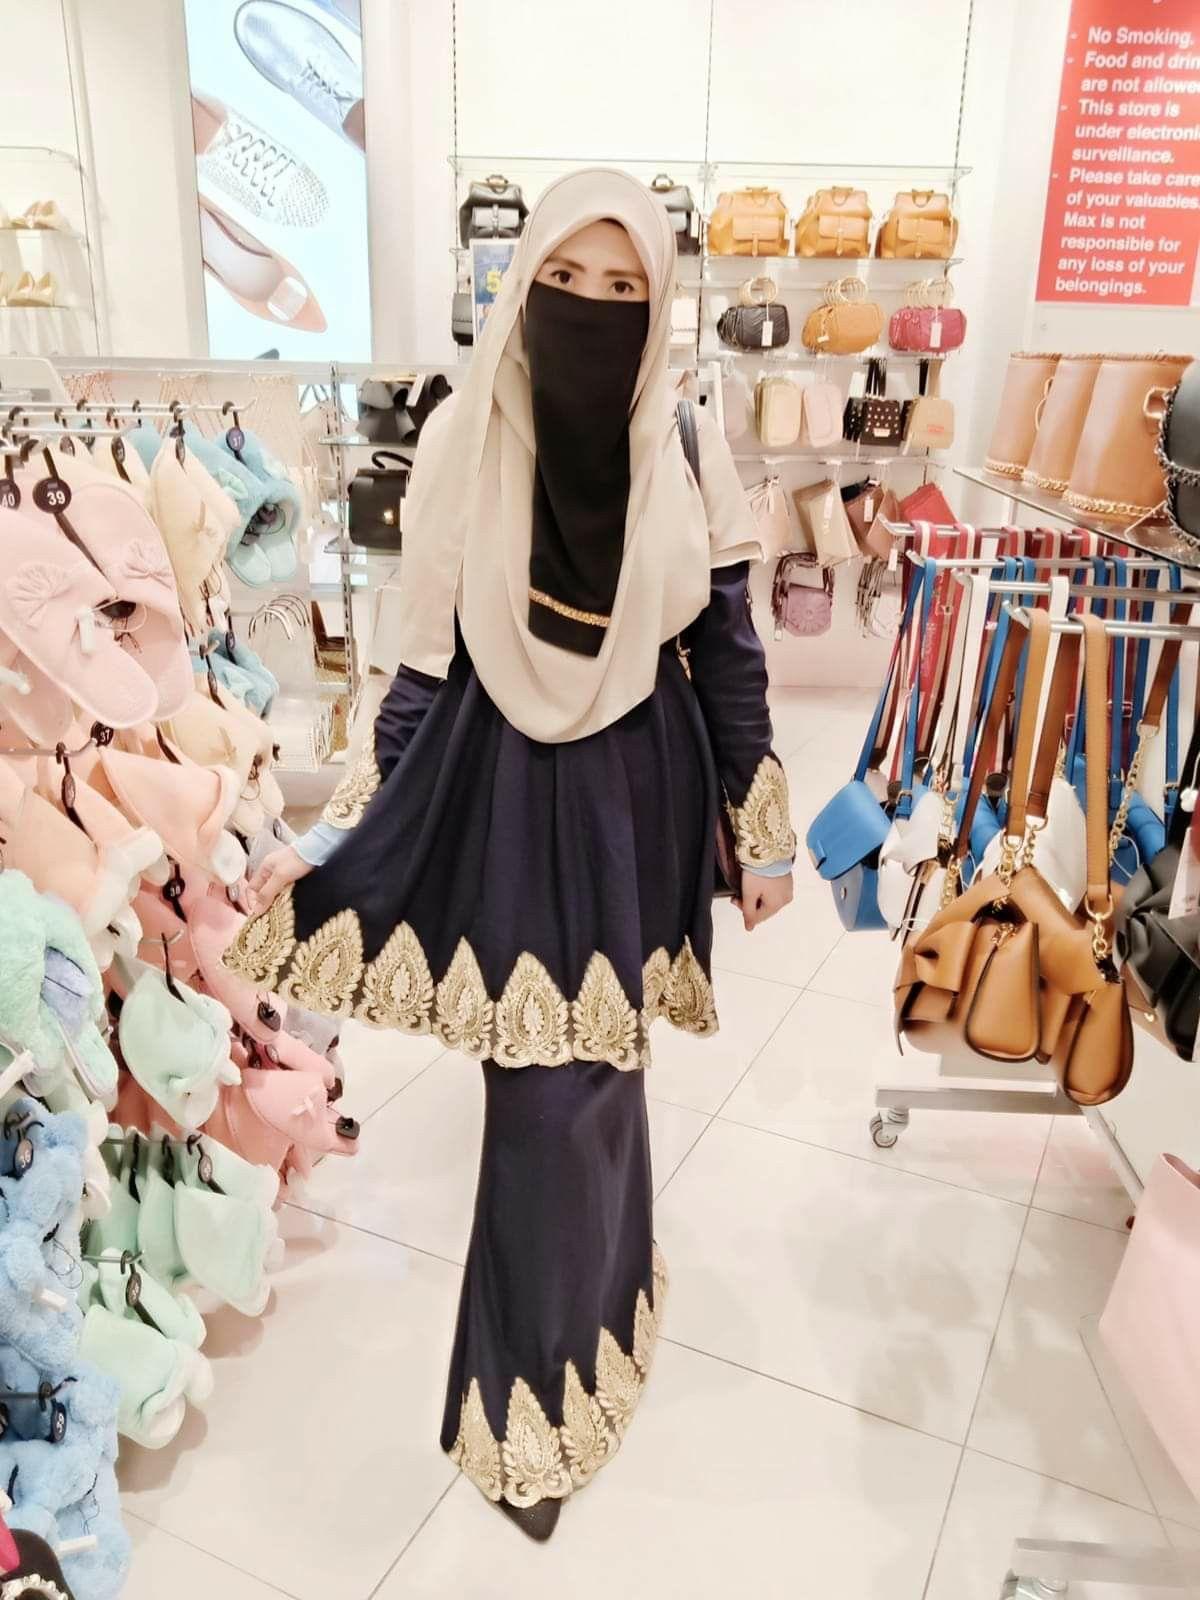 Pin oleh M.Fuad Arifin di Niqabis Hijab, Inspirasi